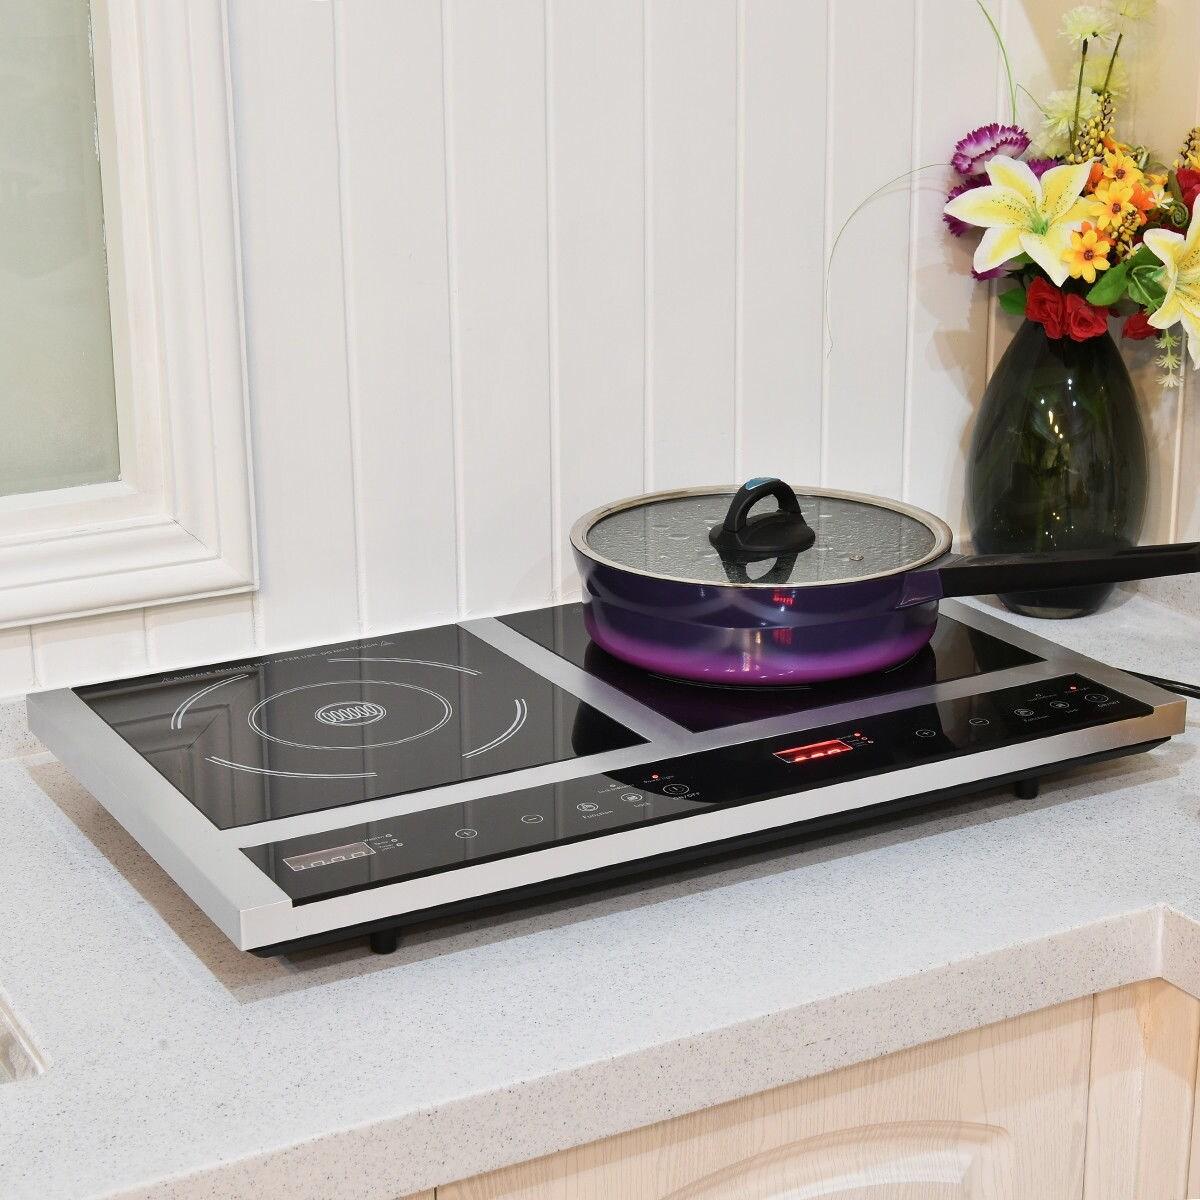 countertops naks electric countertop stove induction range